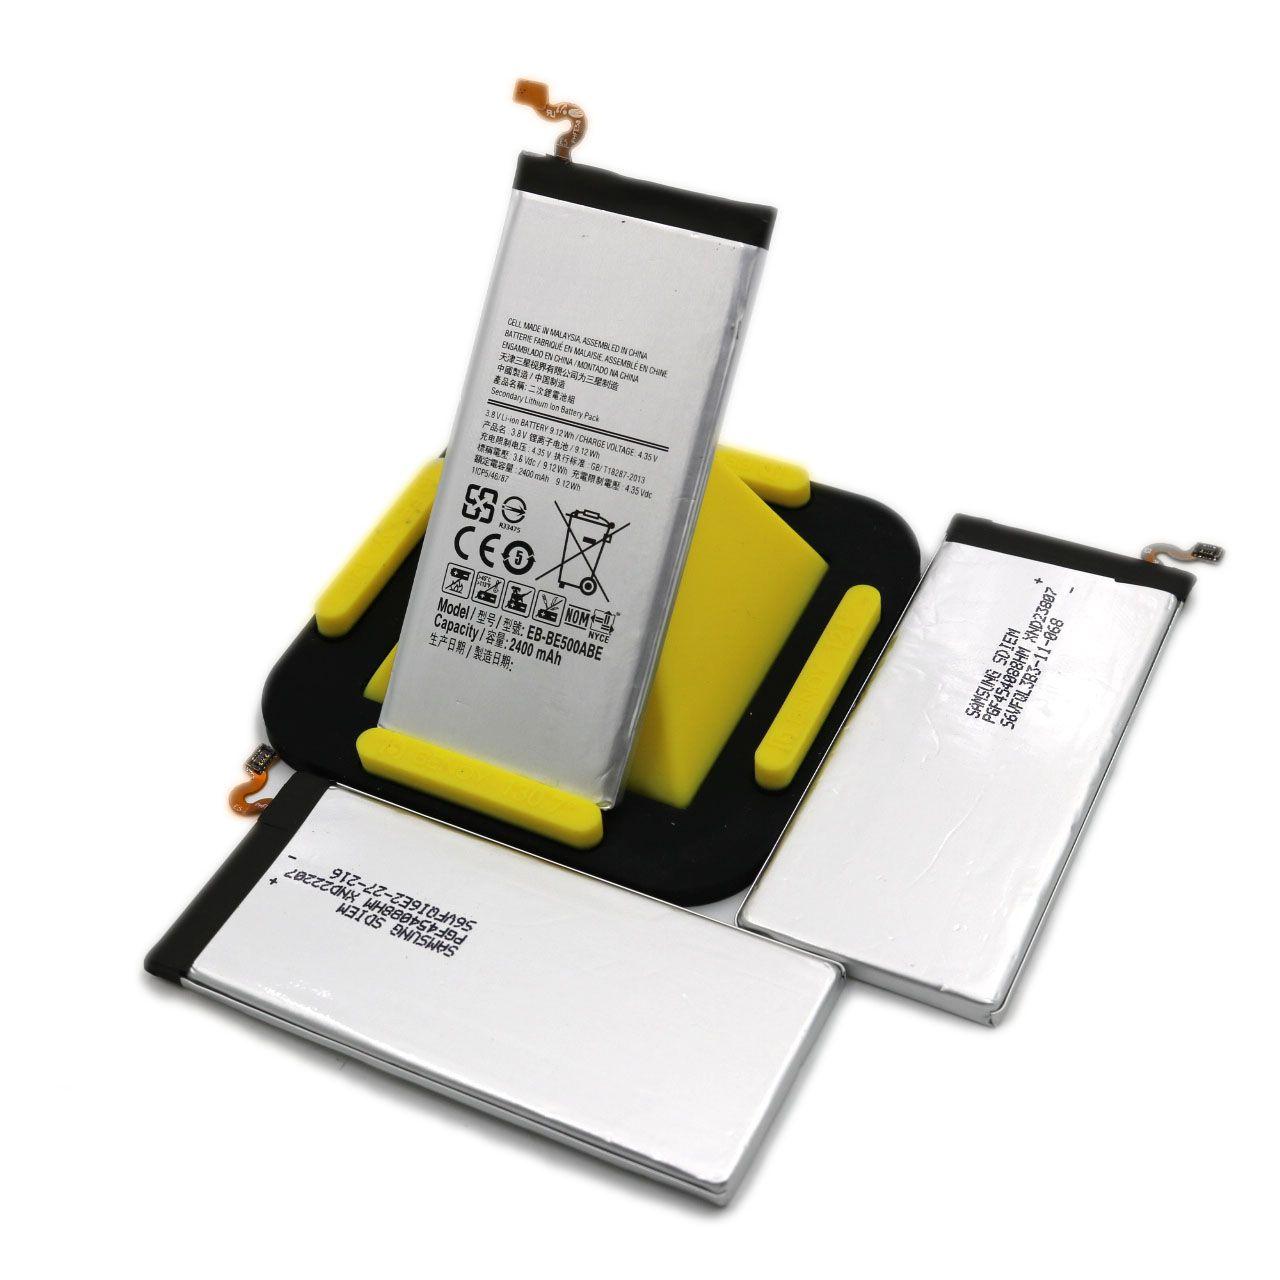 Samsung Galaxy E5 Için toptan Pil 2400 mAh EB-BE500ABE E5000 Telefon batterie Galaxy A5 Dahili Yedek polimer Pil